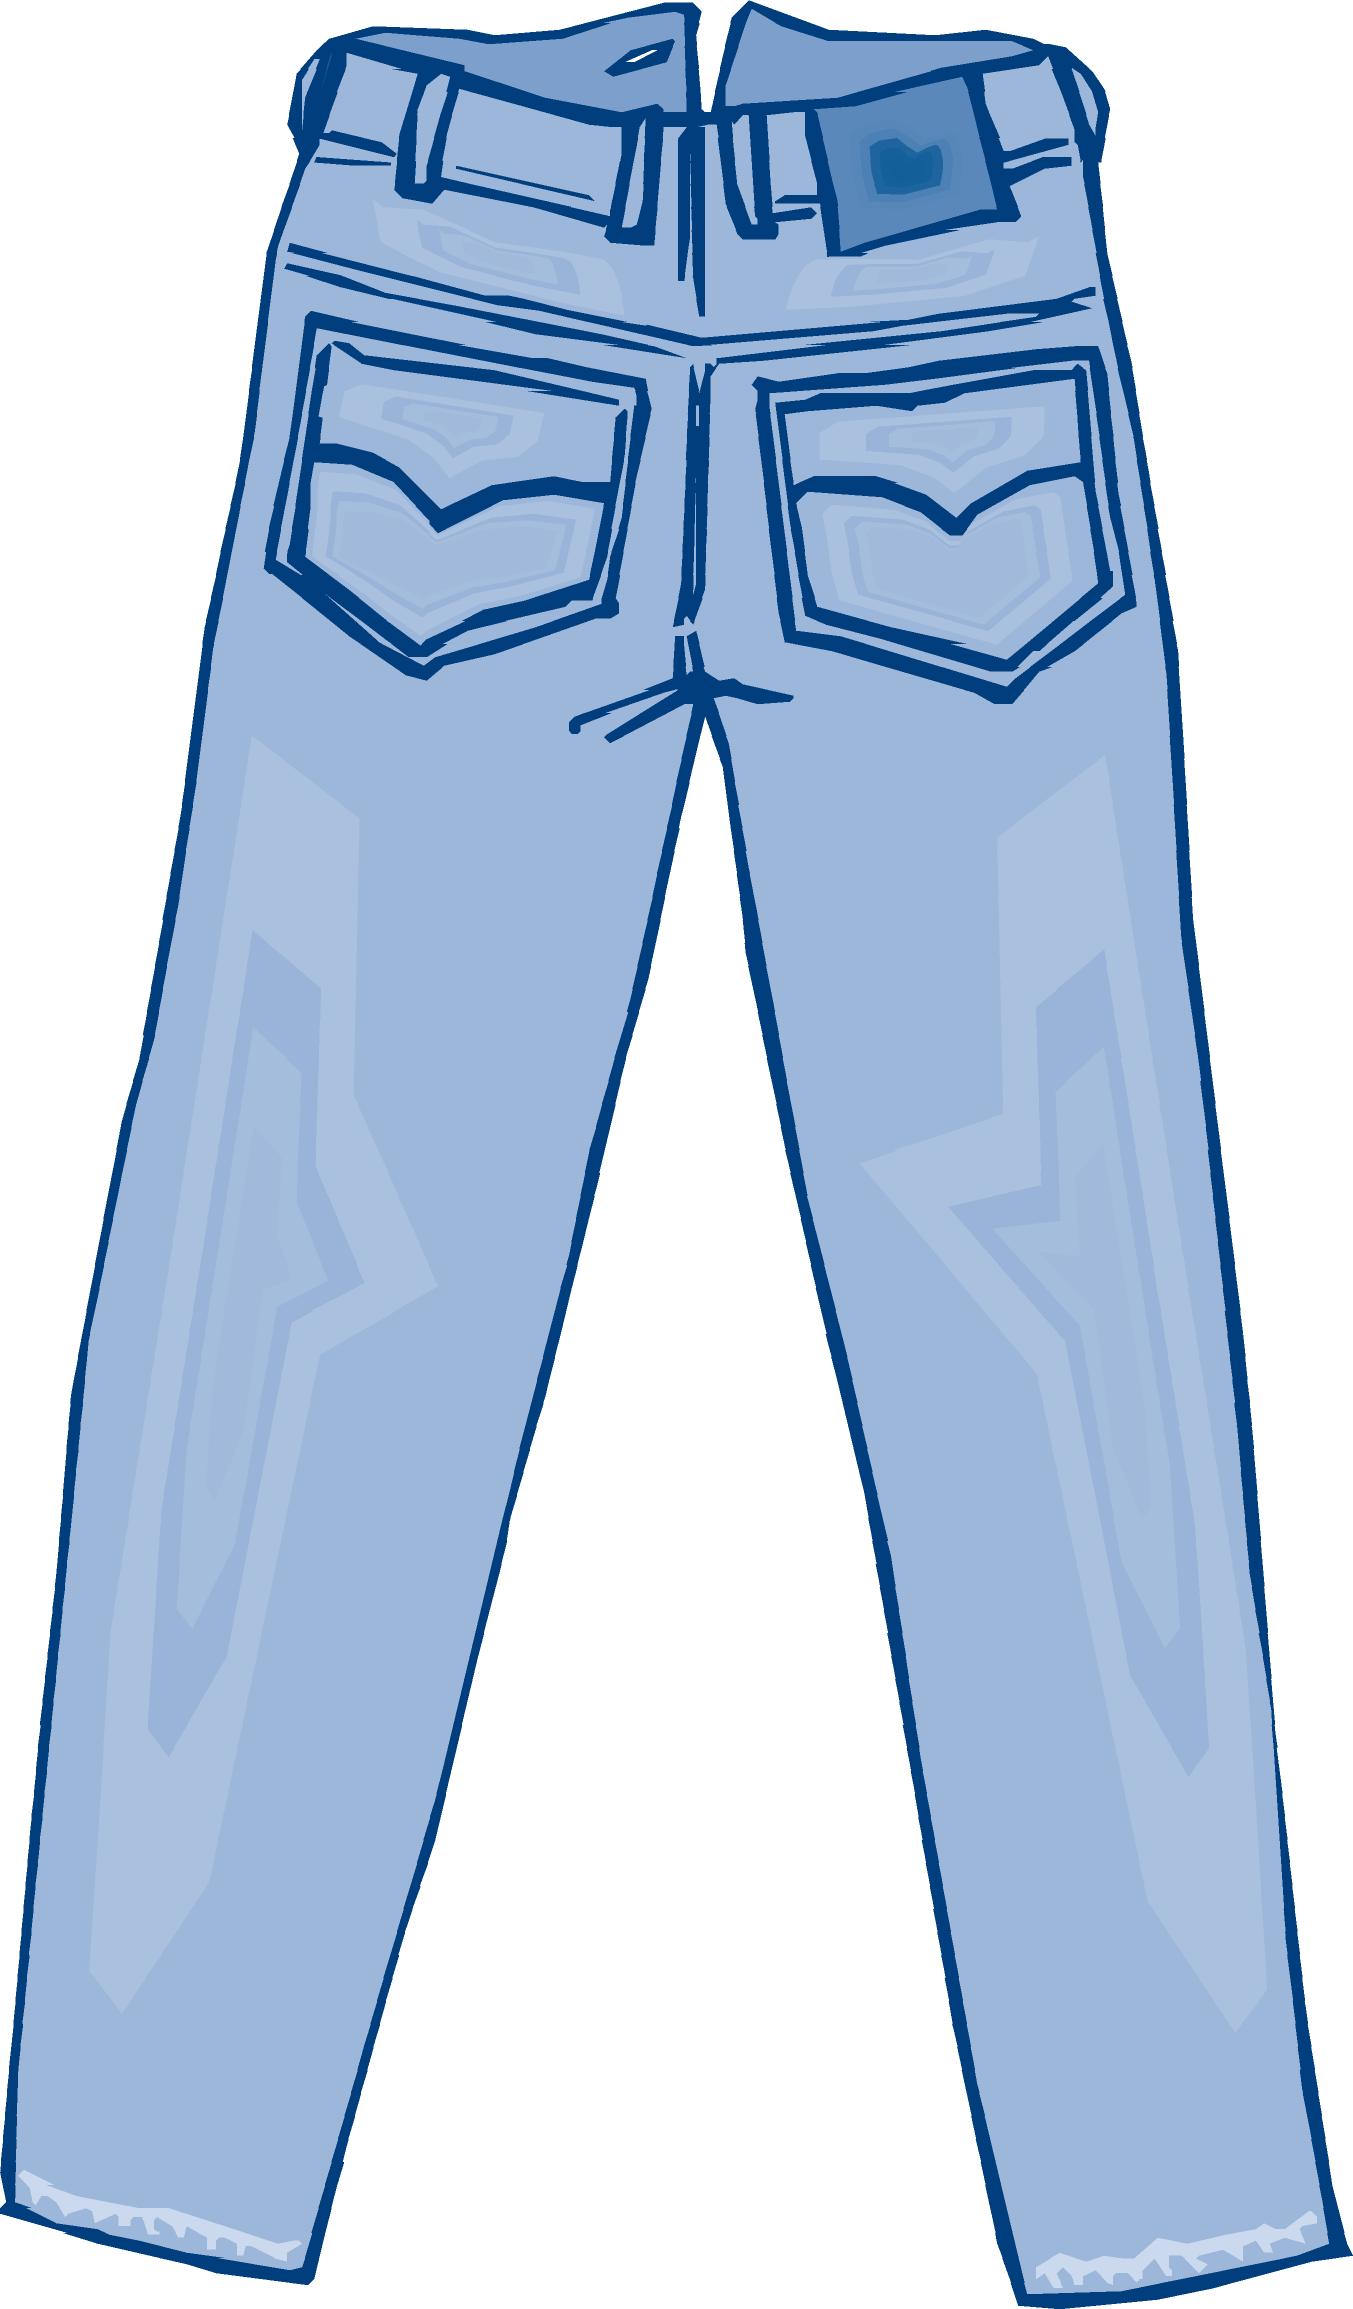 Free clipart jeans 2 » Clipart Portal.